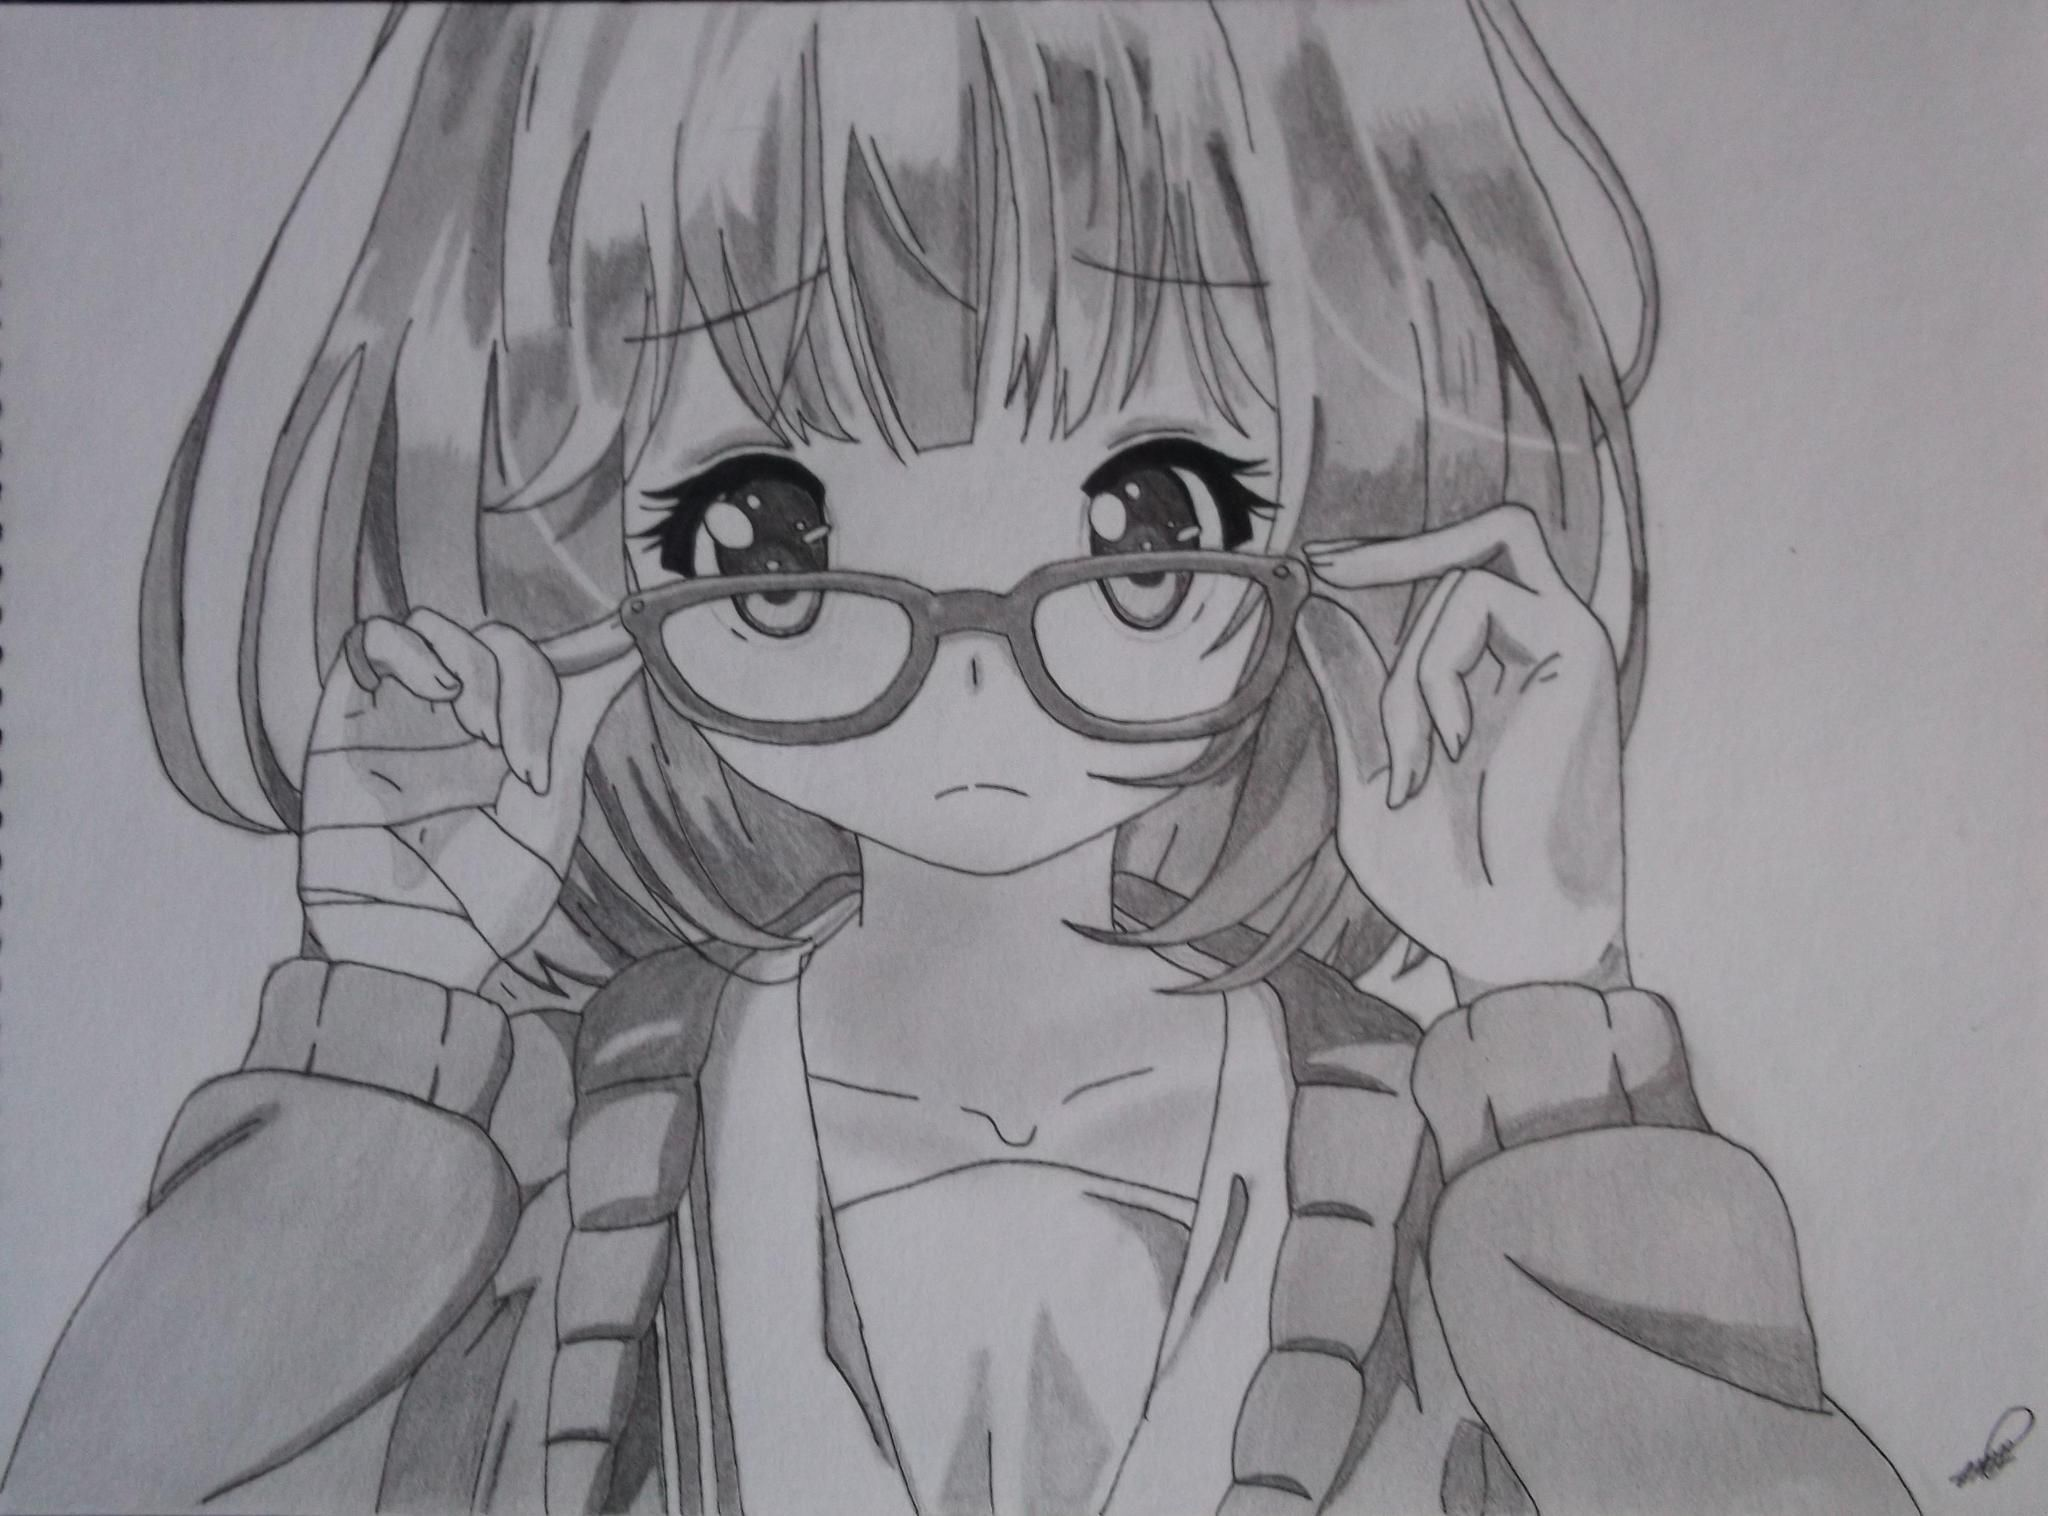 manga anime dibujo - Buscar con Google | japanese | Pinterest ...